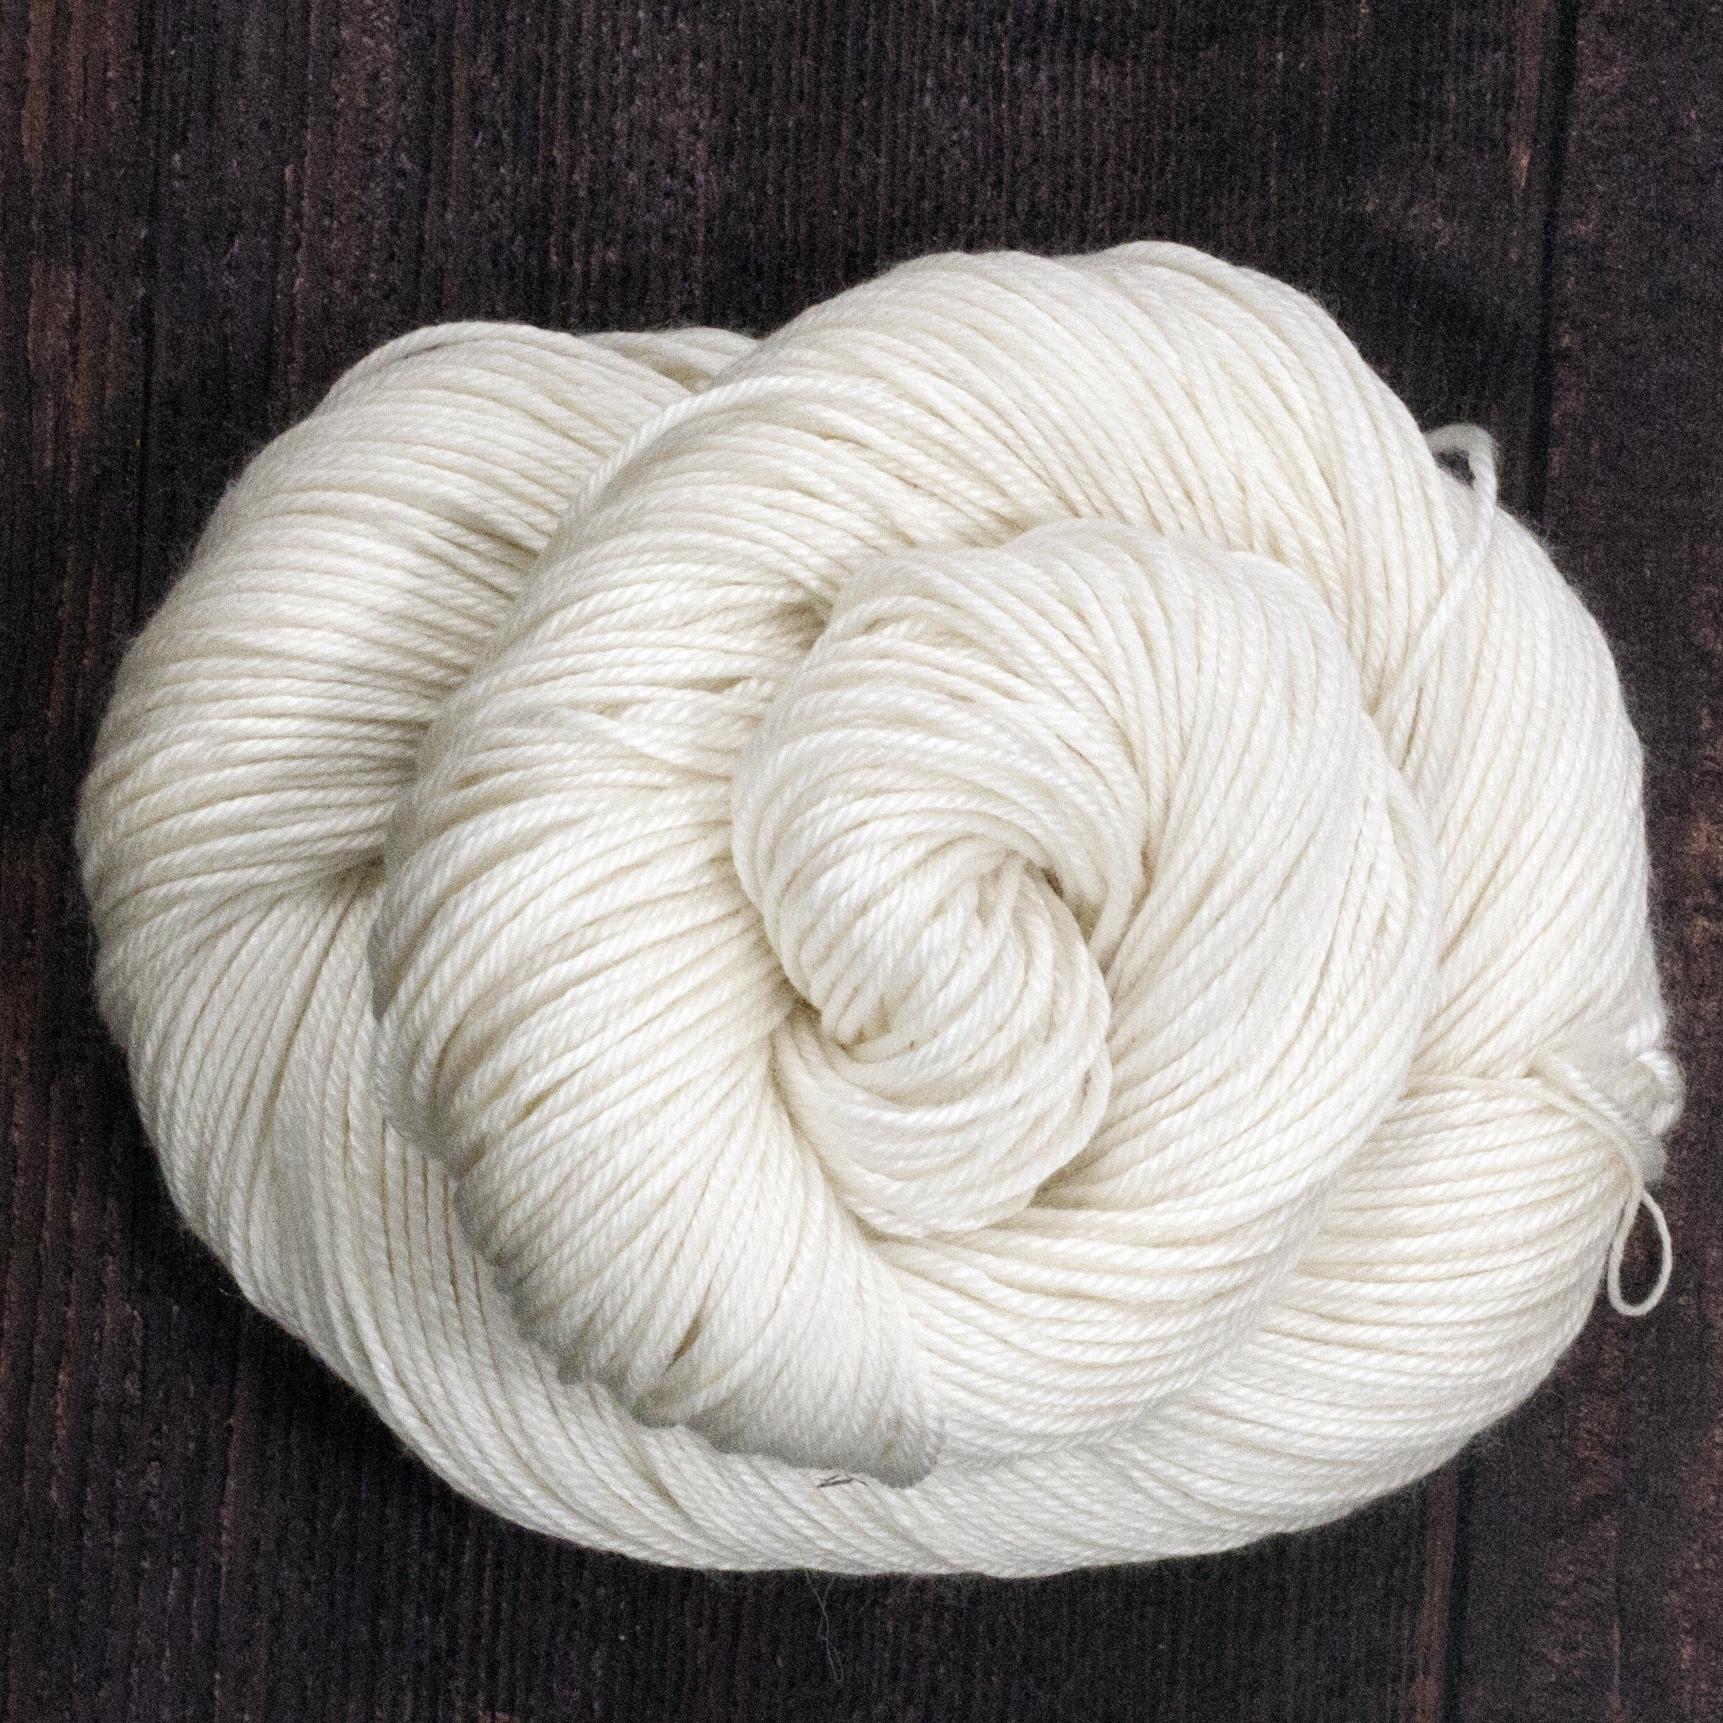 Type 49209  Silky 50/50 DK 50% Superwash Merino Wool 50% Silk  100g Hanks 212m per 100g 4/8.5nm